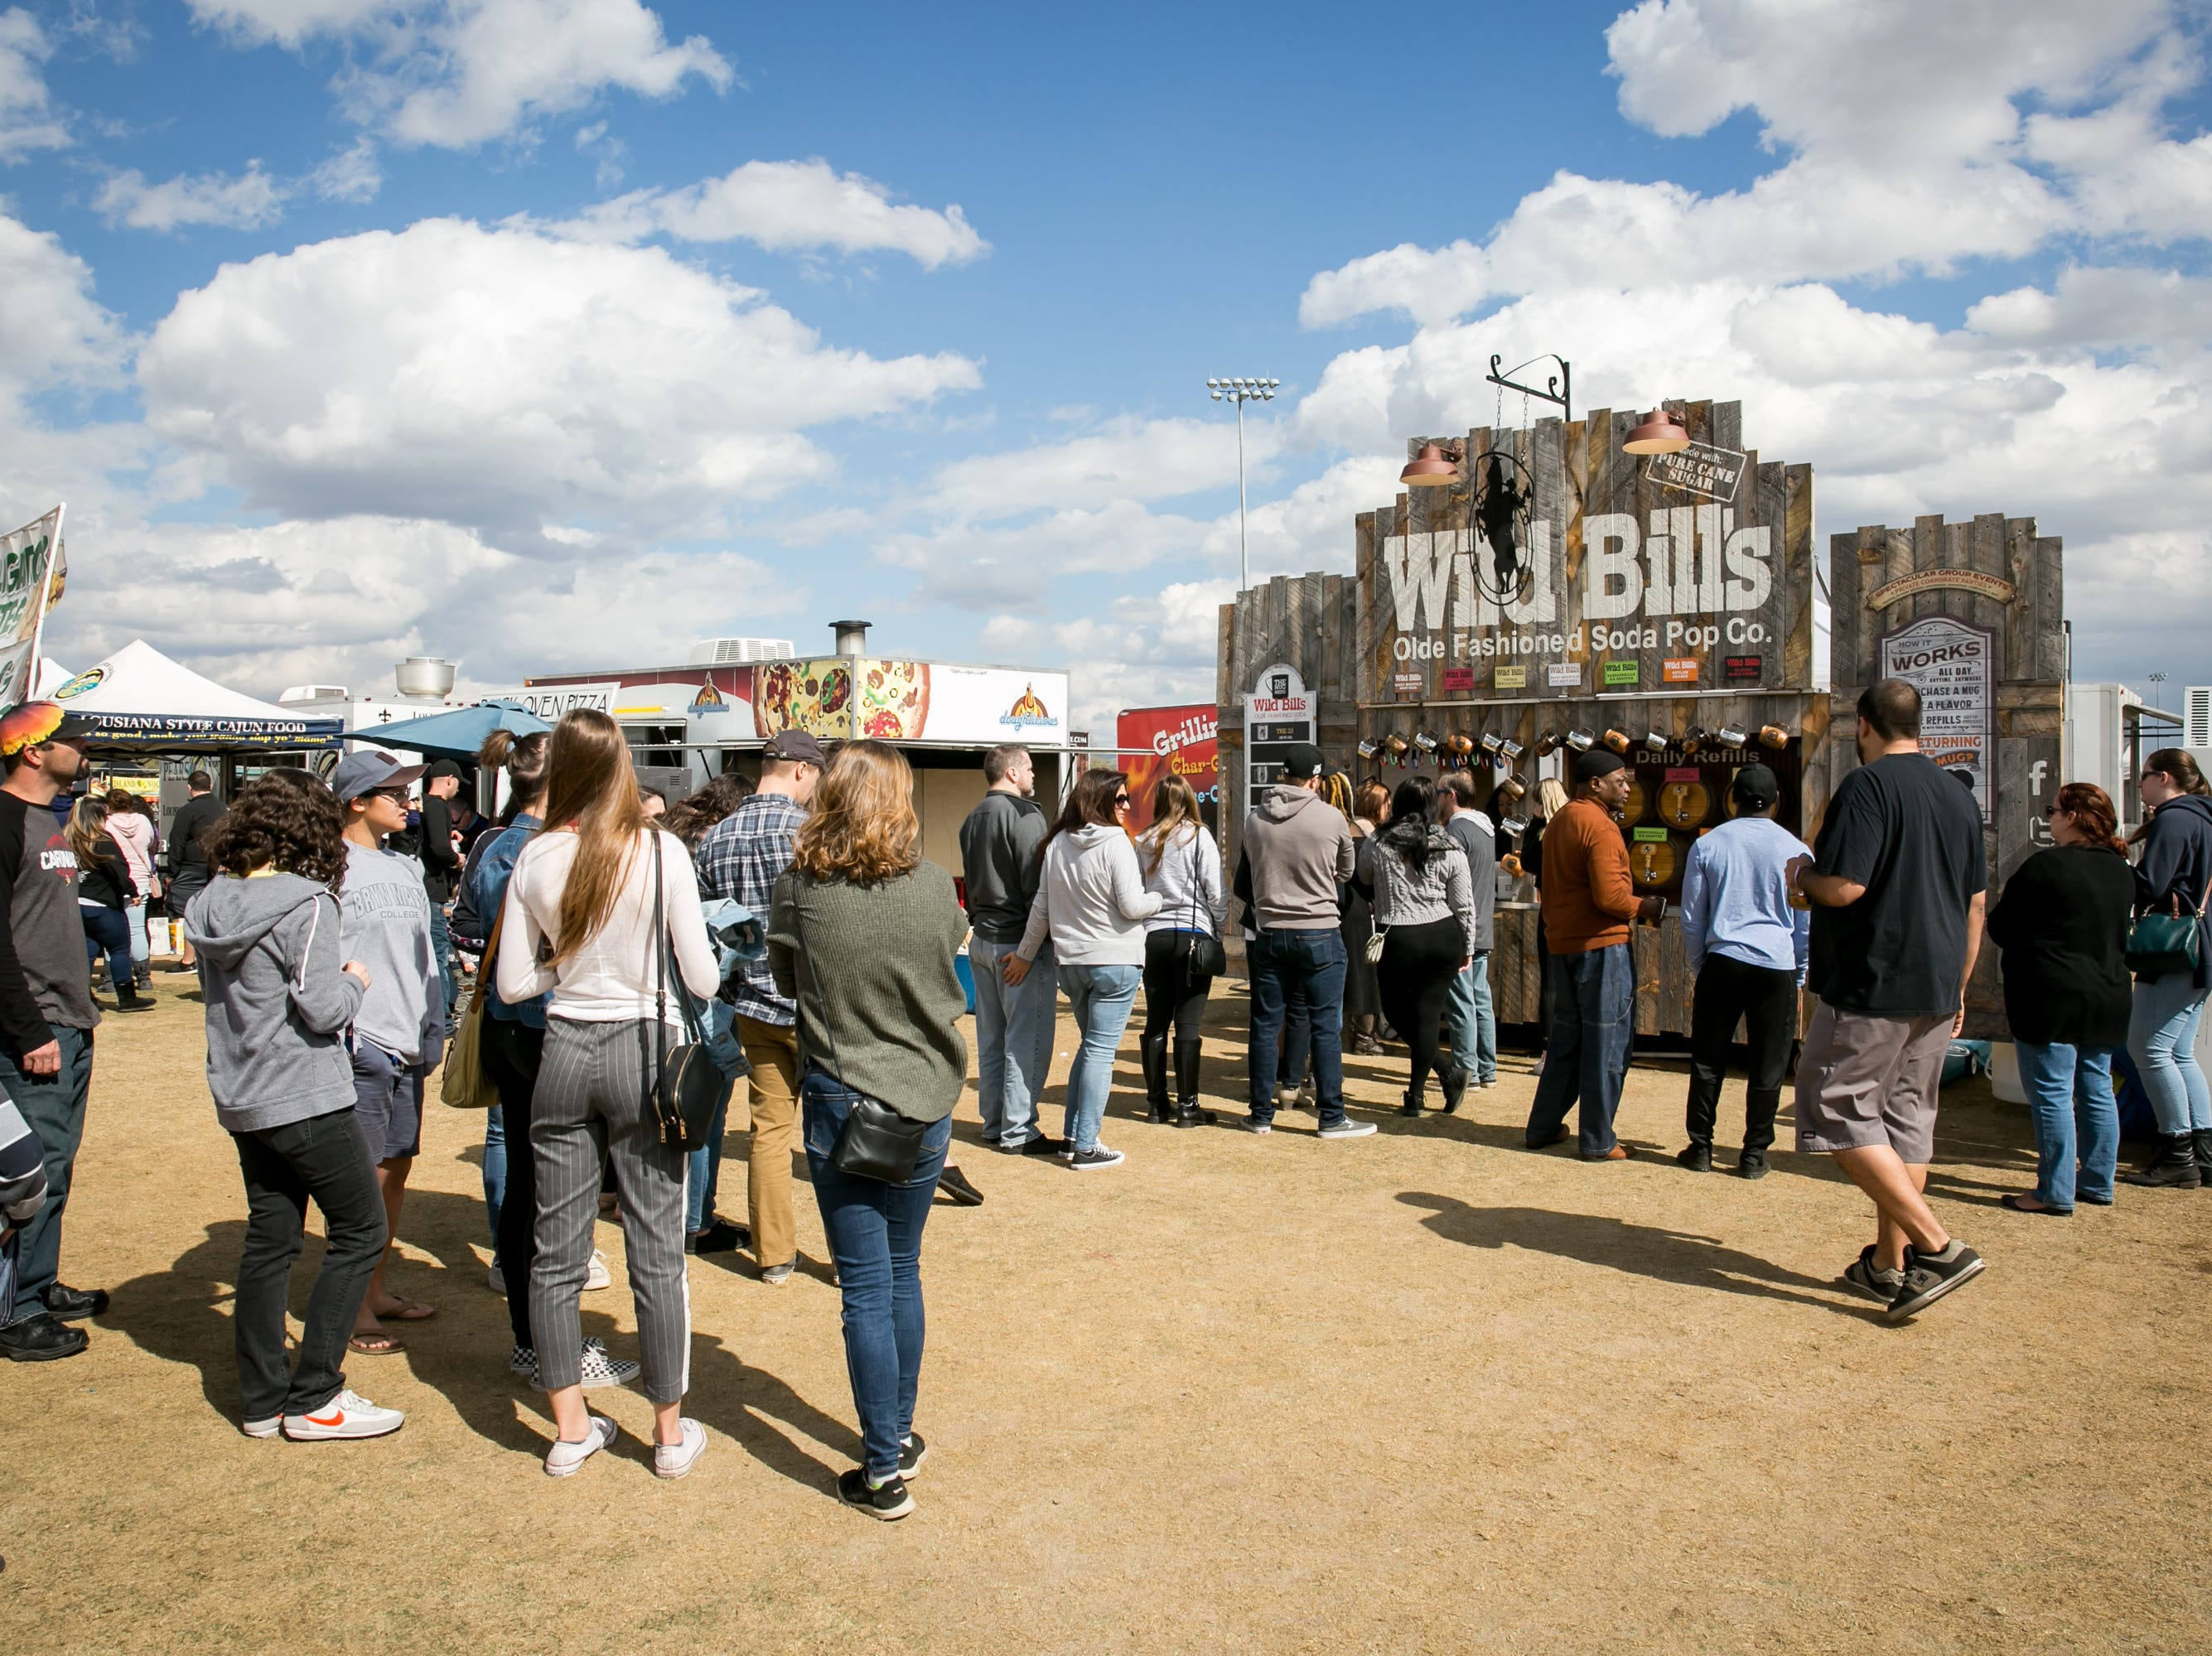 Wild Bill's sodas were a popular choice during the Street Eats Food Truck Festival at Salt River Fields near Scottsdale on Feb. 17, 2019.